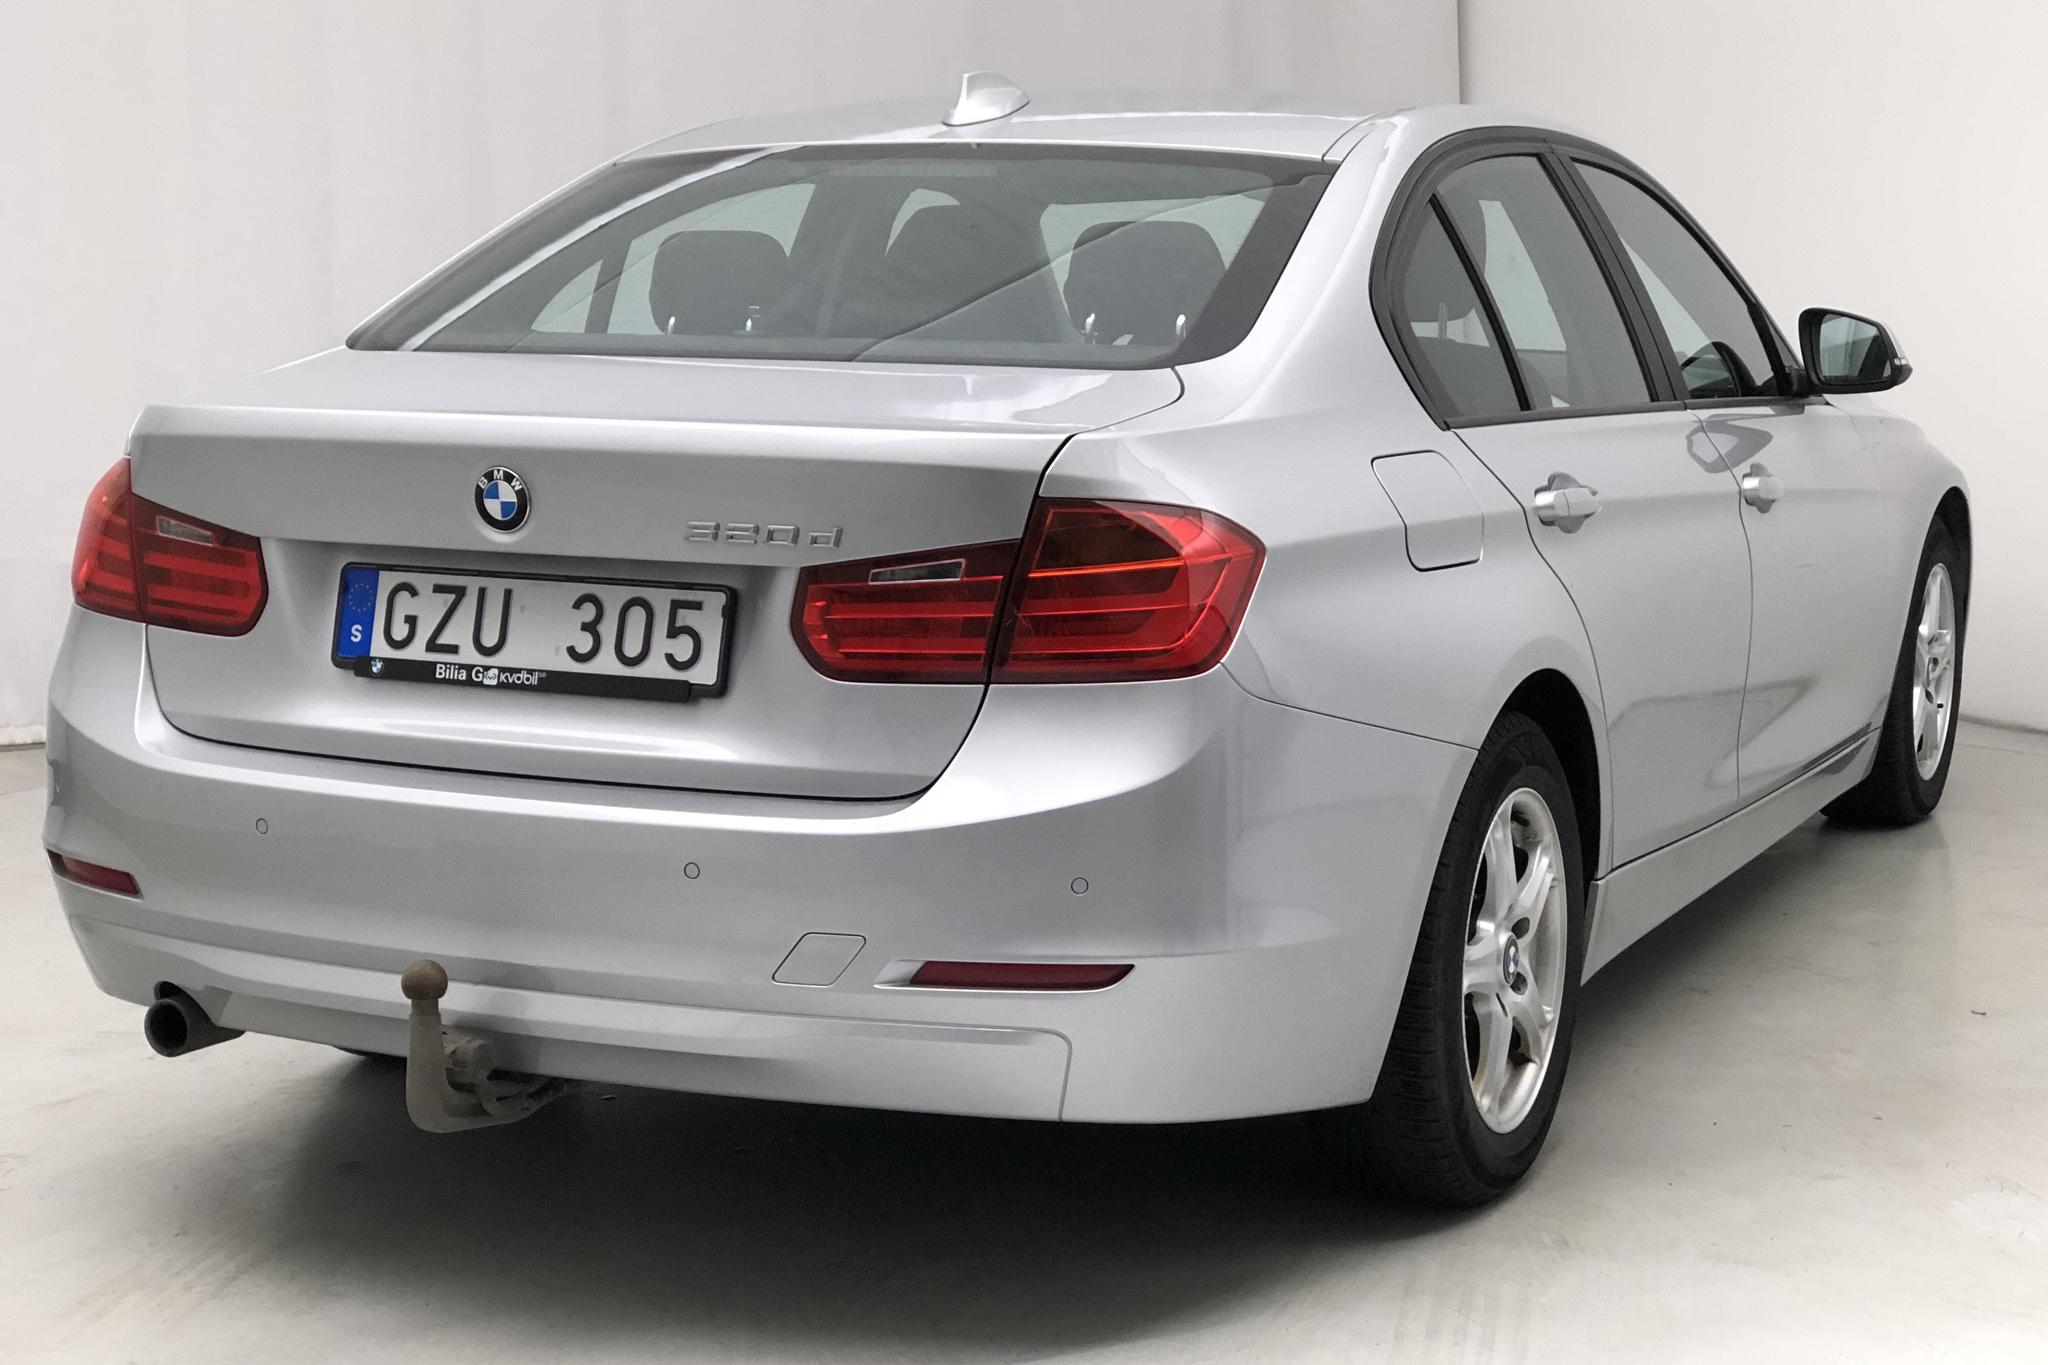 BMW 320d Sedan, F30 (184hk) - 97 026 km - Automatic - silver - 2013